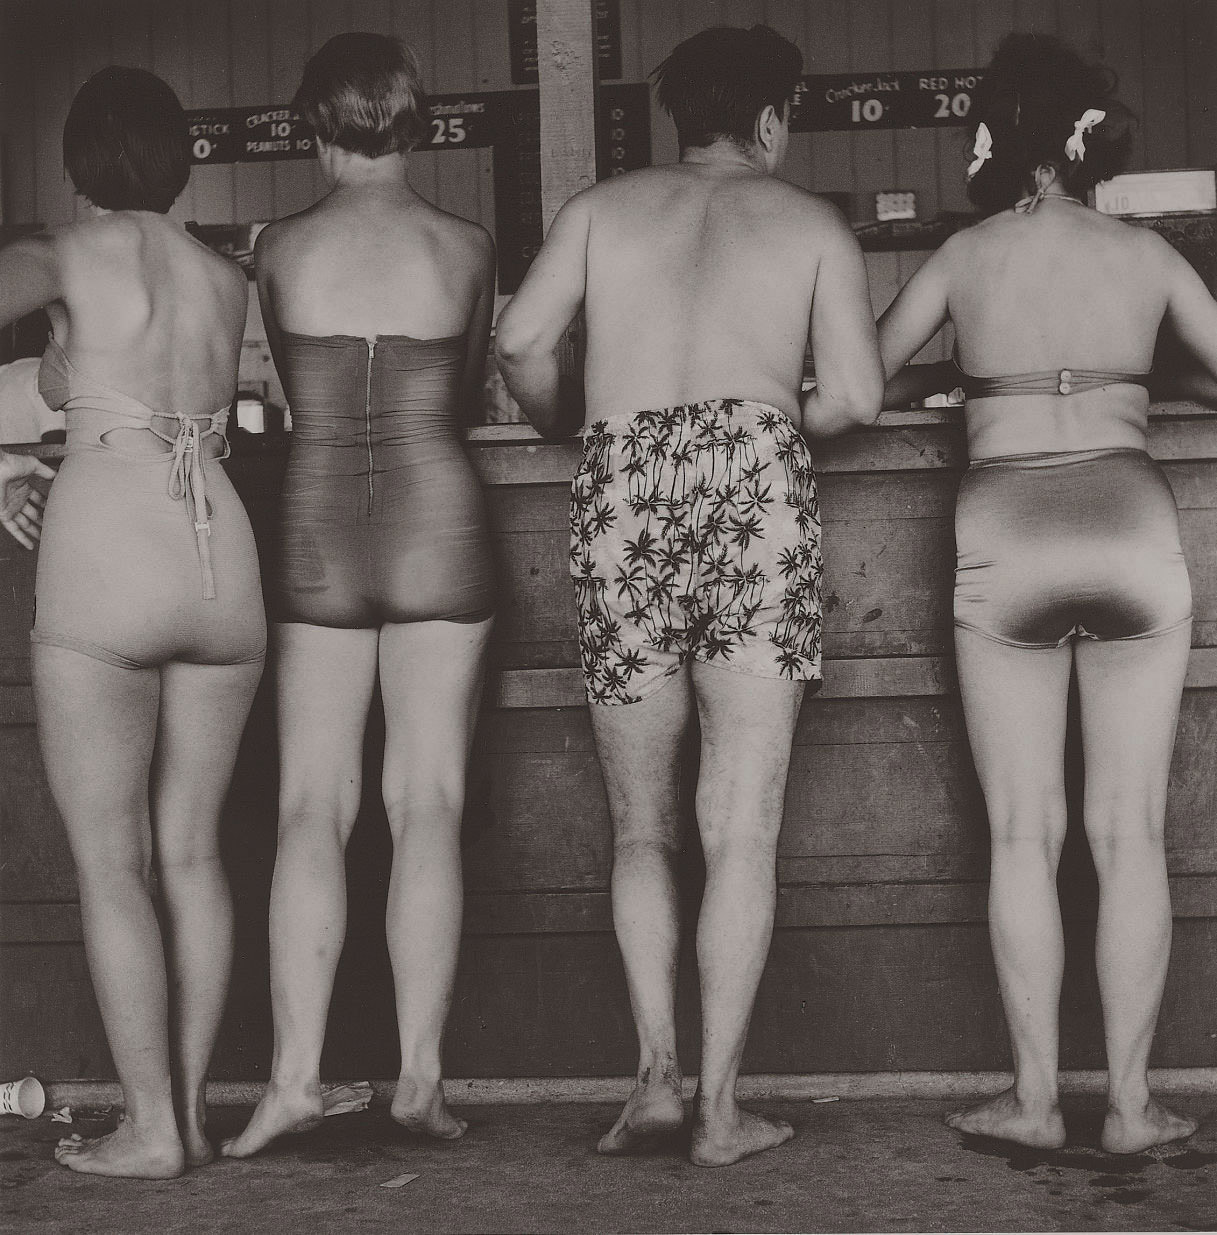 North Avenue Beach, Chicago, c. 1952